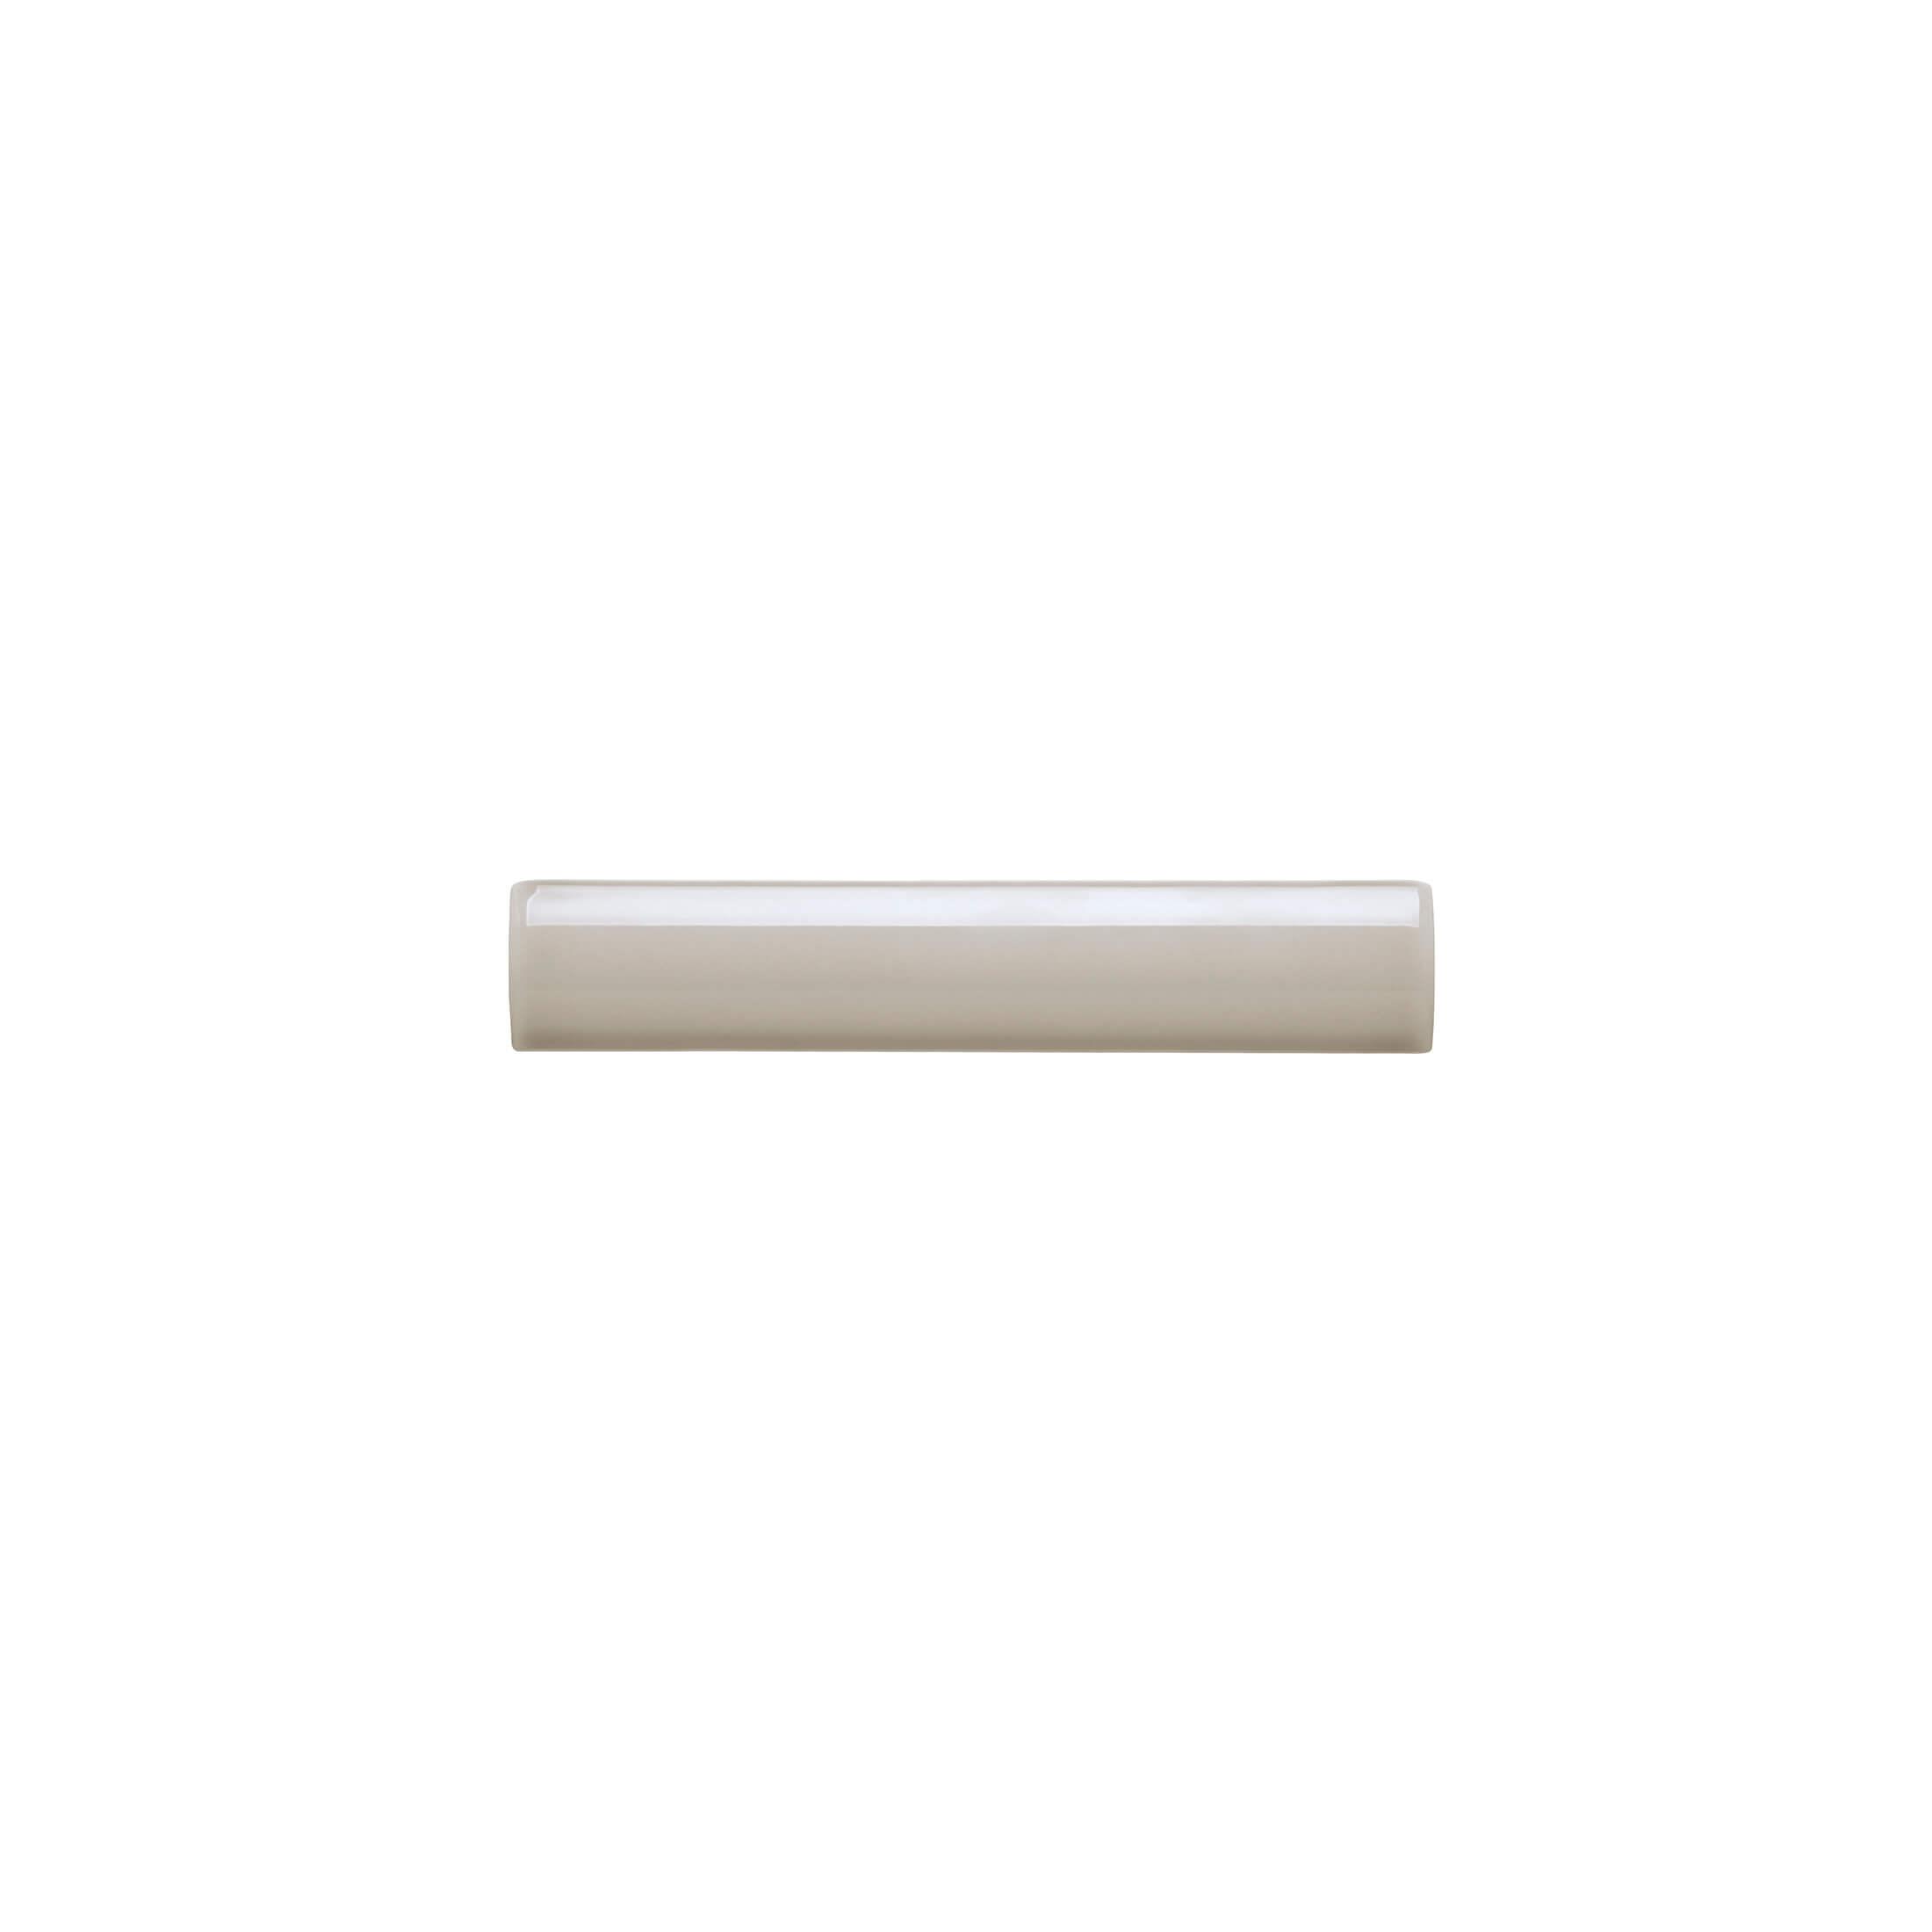 ADNE5497 - CUBRECANTO PB - 2.5 cm X 15 cm